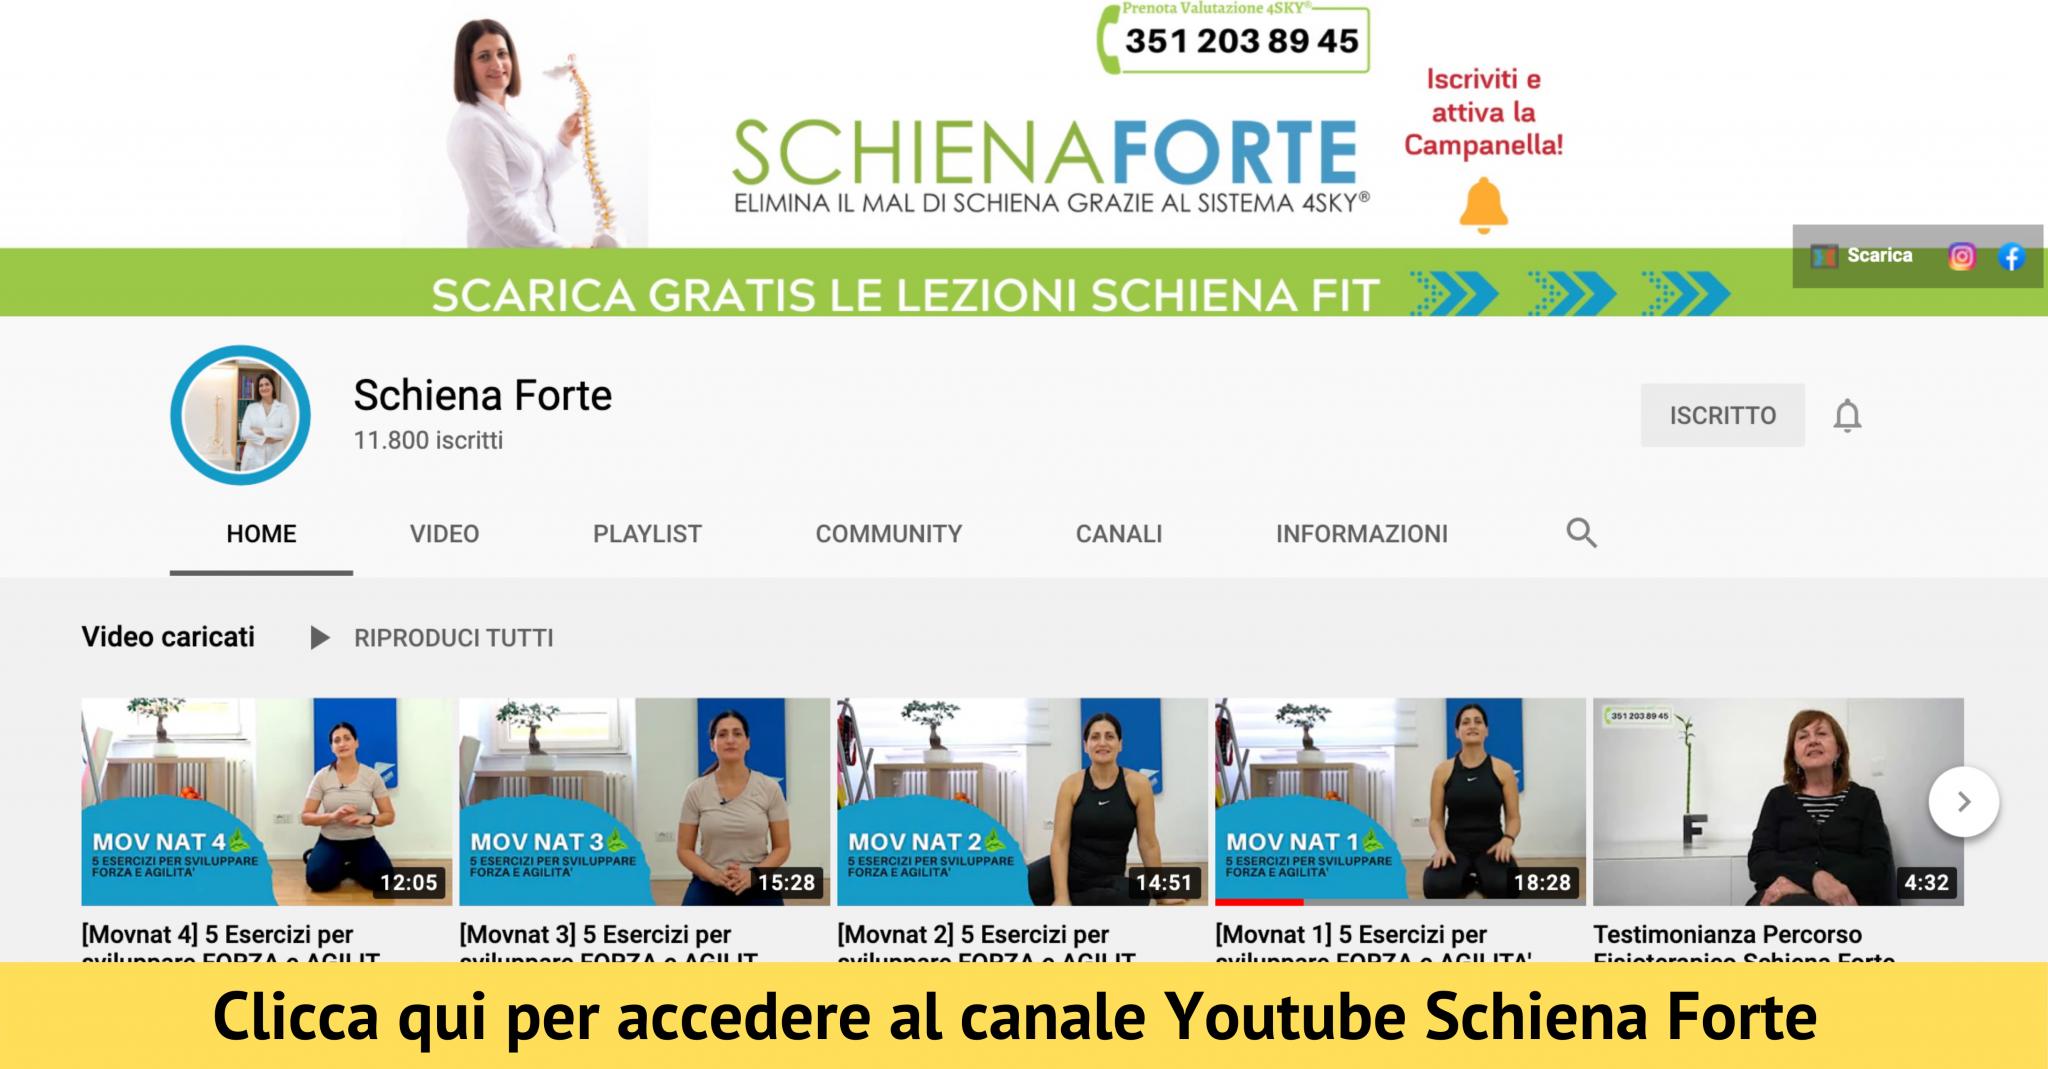 Schiena Forte Canale Youtube